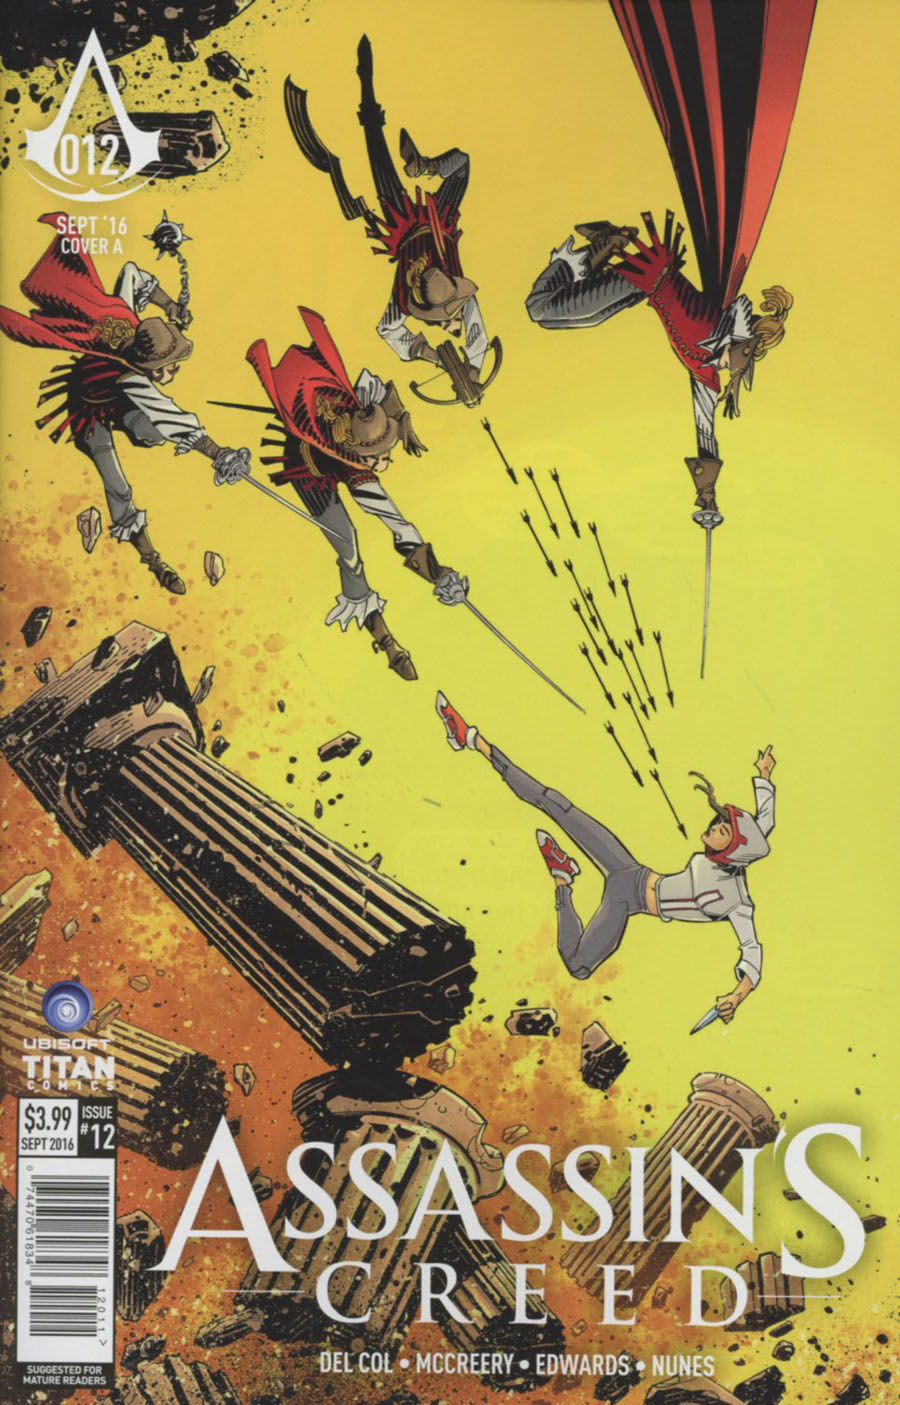 Assassins Creed #12 Cover A Regular John McCrea Cover